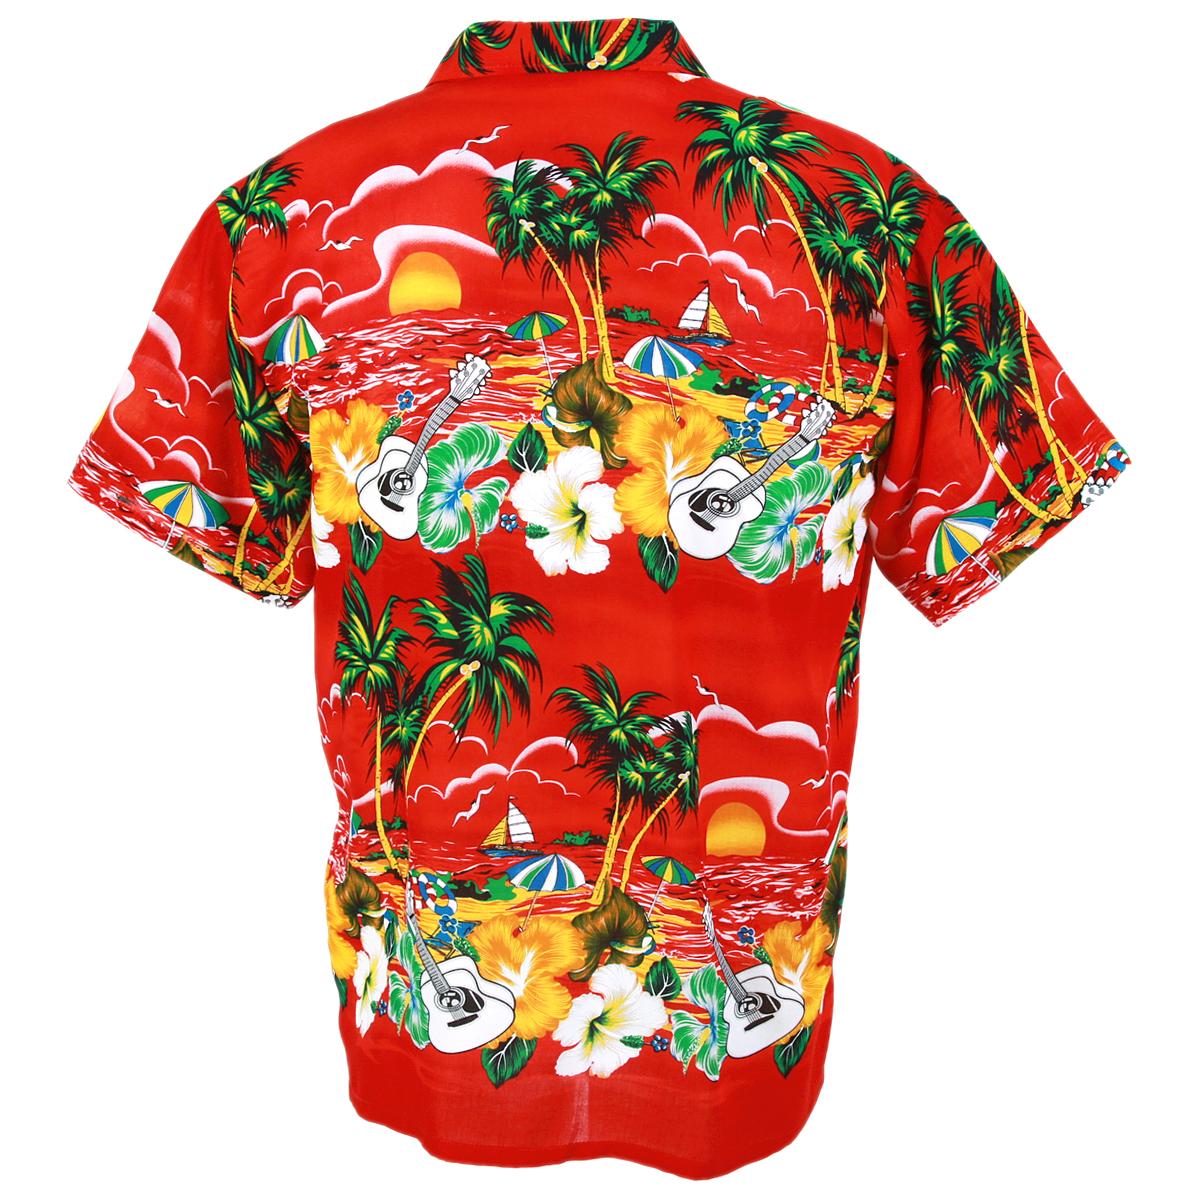 2e0c85eed1 Where To Buy Hawaiian Shirts Cheap - DREAMWORKS